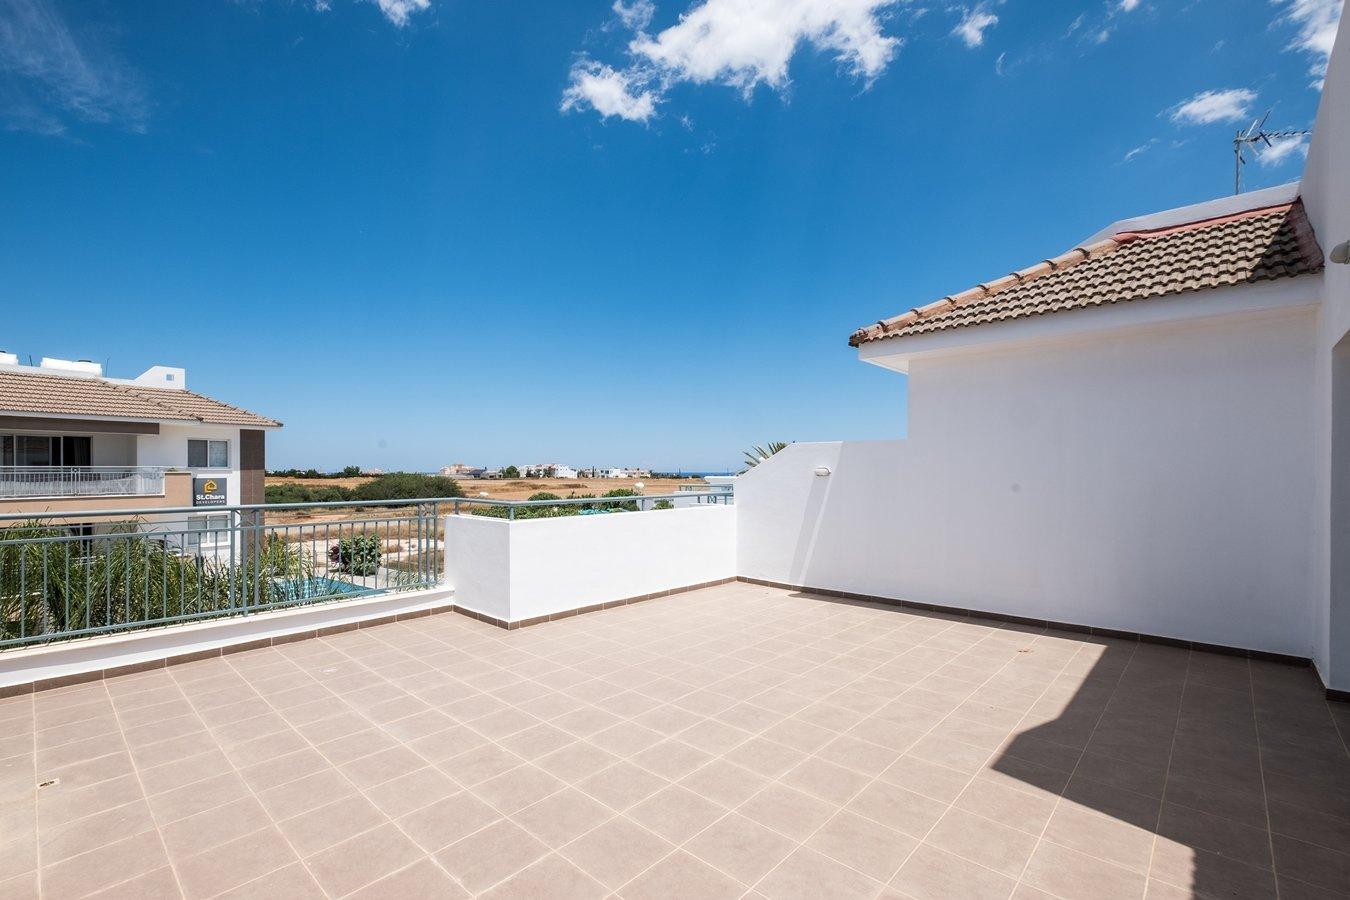 Chara-Kypria-Apartments-204-DSCF0540